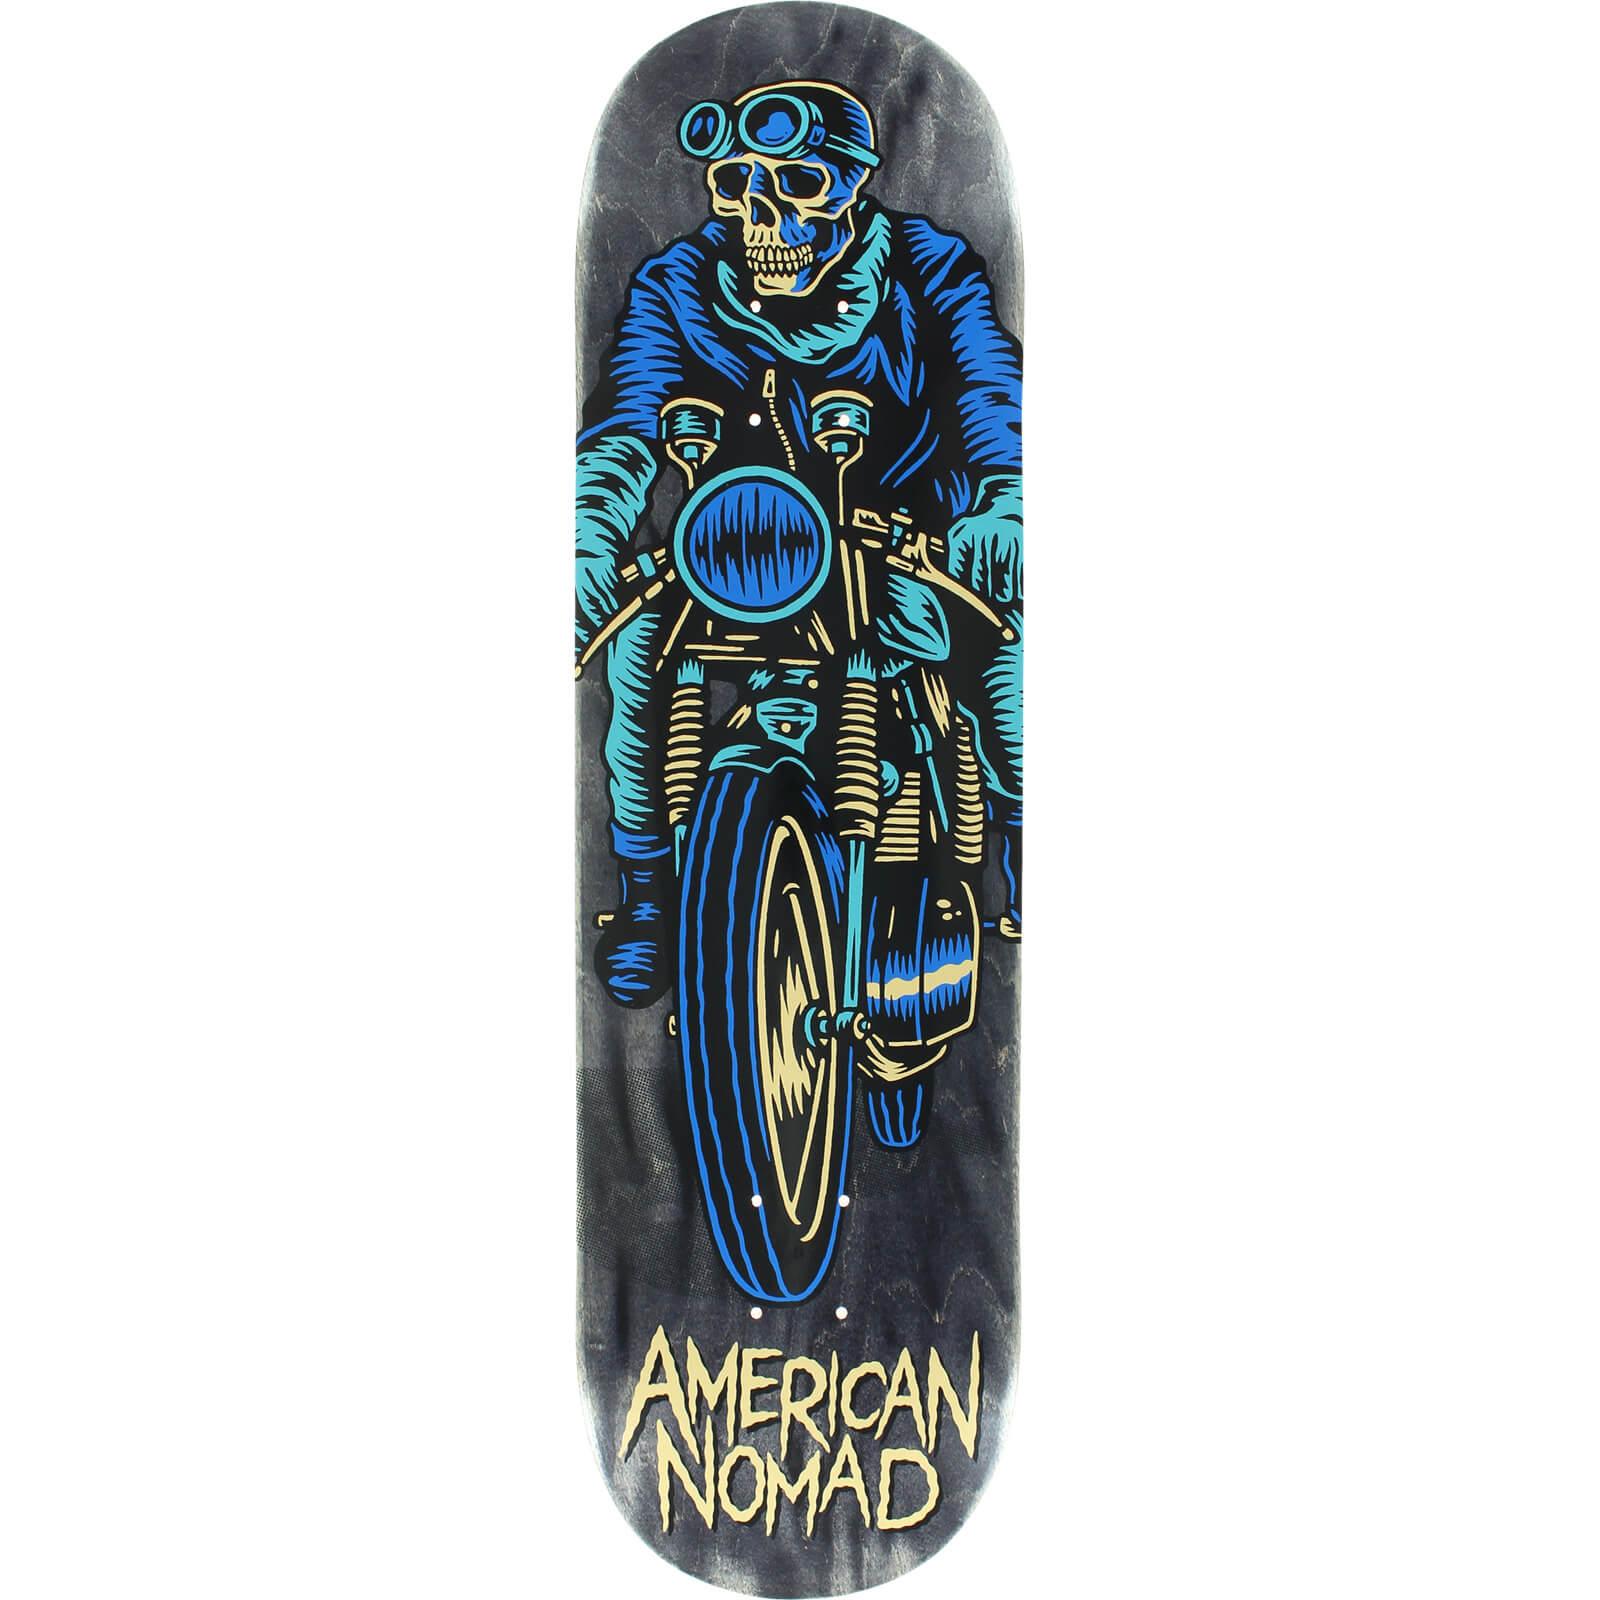 7a52e278916 American Nomad Skateboards Cafe Racer Black Skateboard Deck 8.5 x 32.5 Warehouse  Skateboards